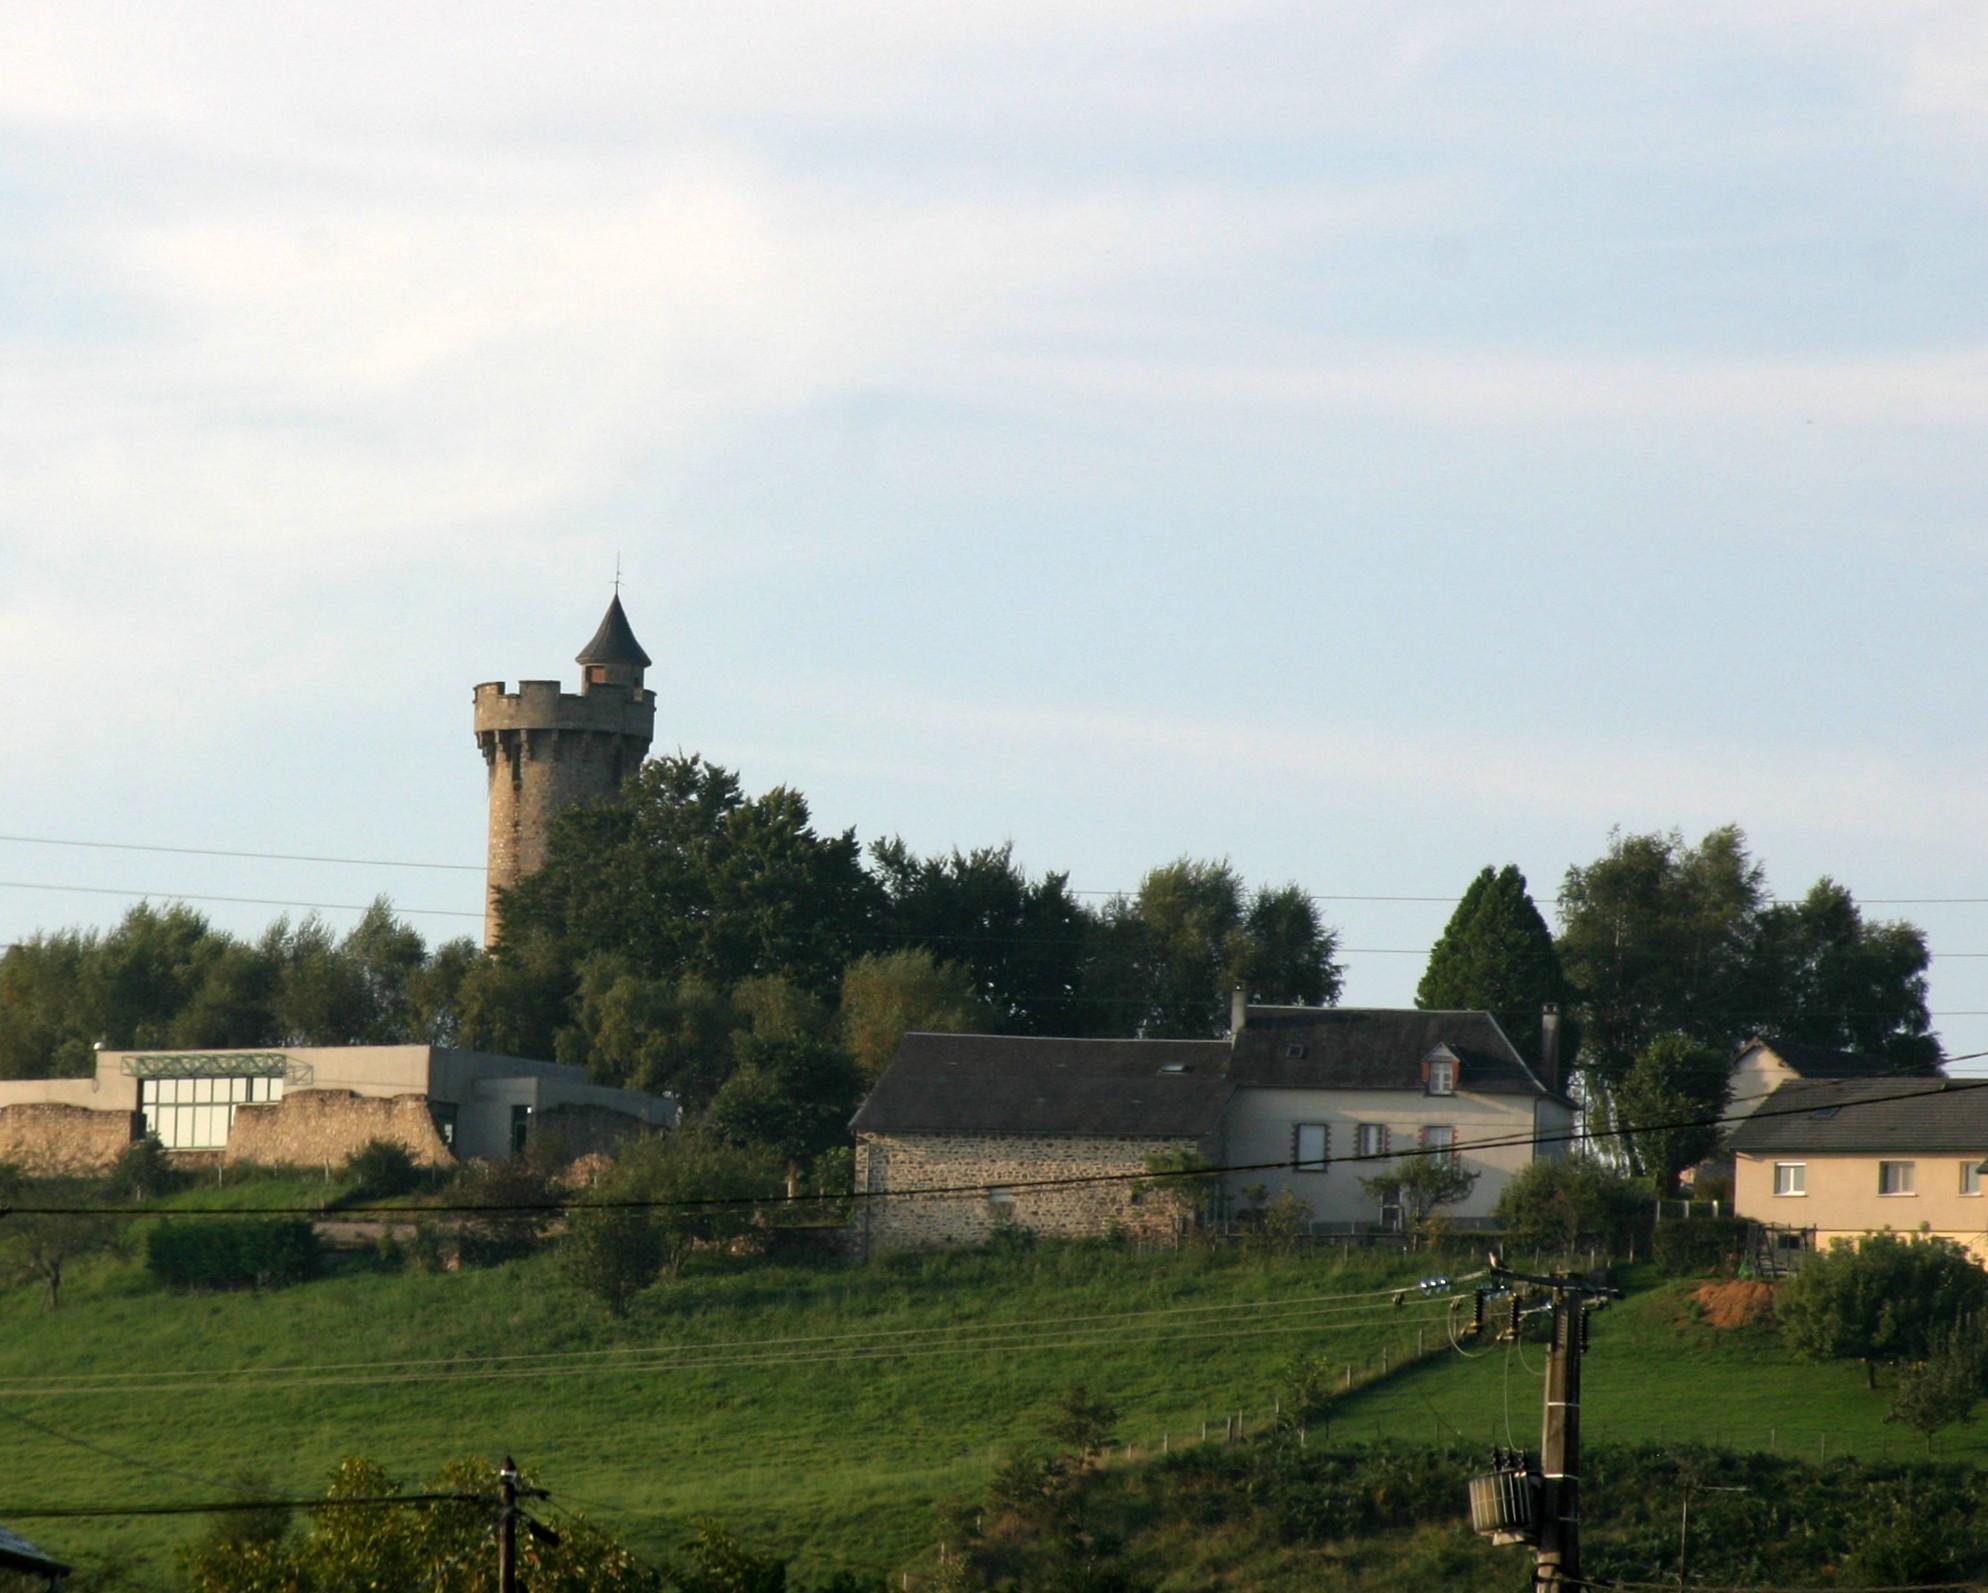 Masseret, Limousin, France - Hilltop Tower